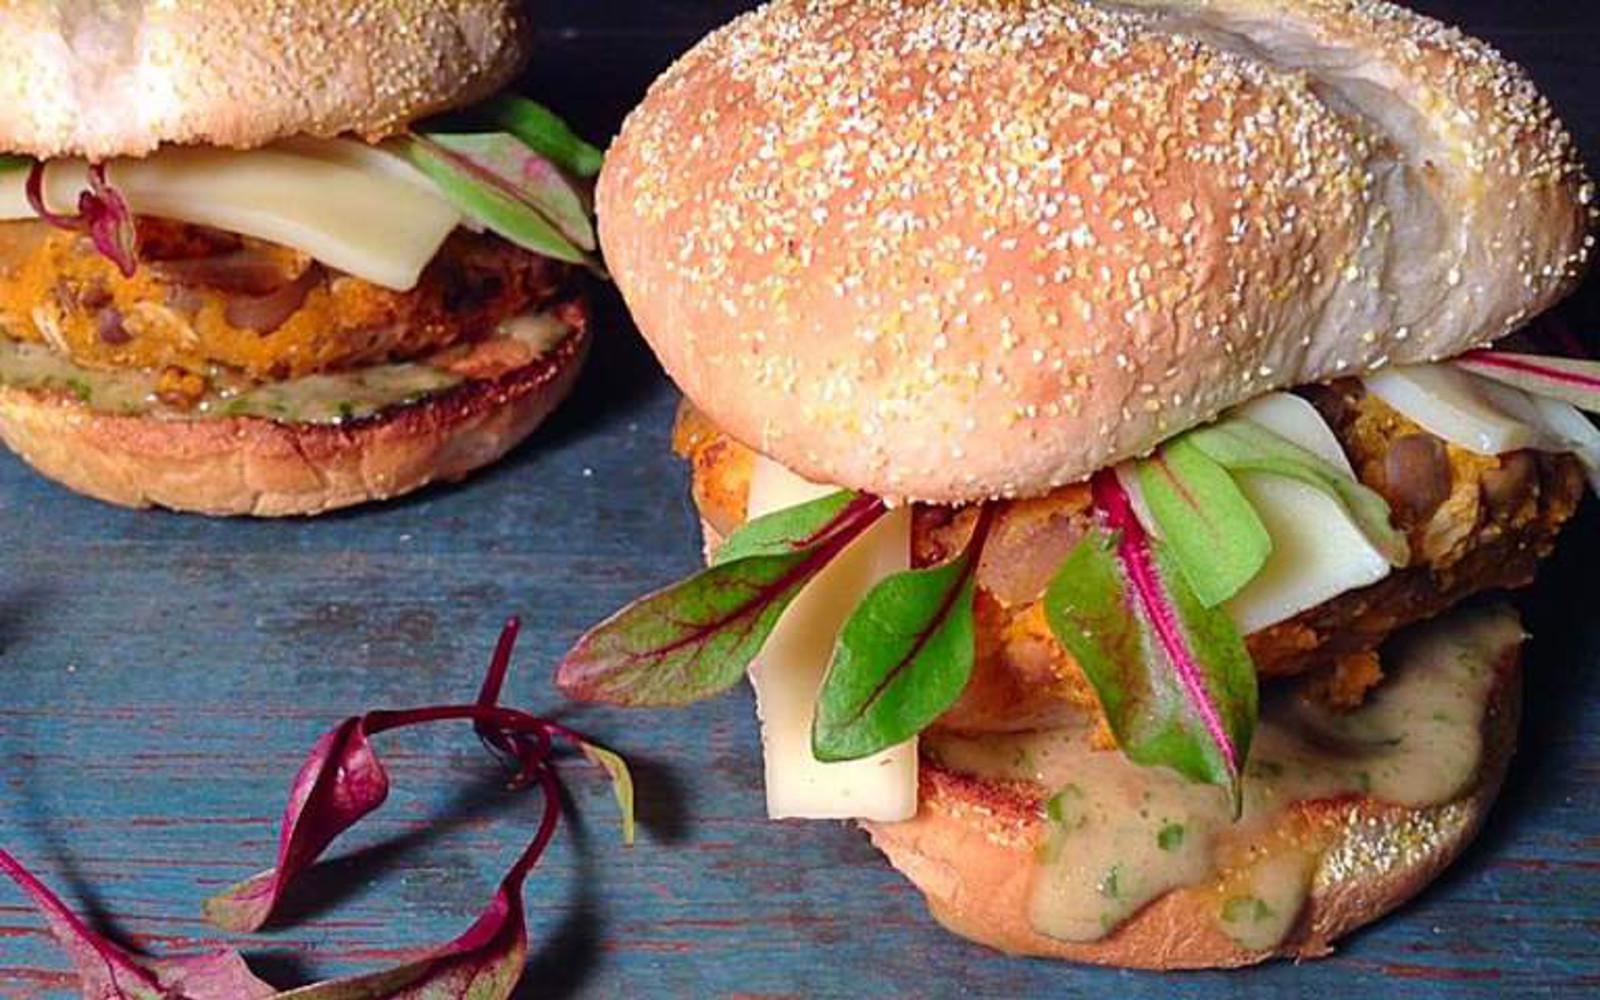 Sweet Potato Cheeseburgers with Peanut Sauce [Vegan, High-Protein]